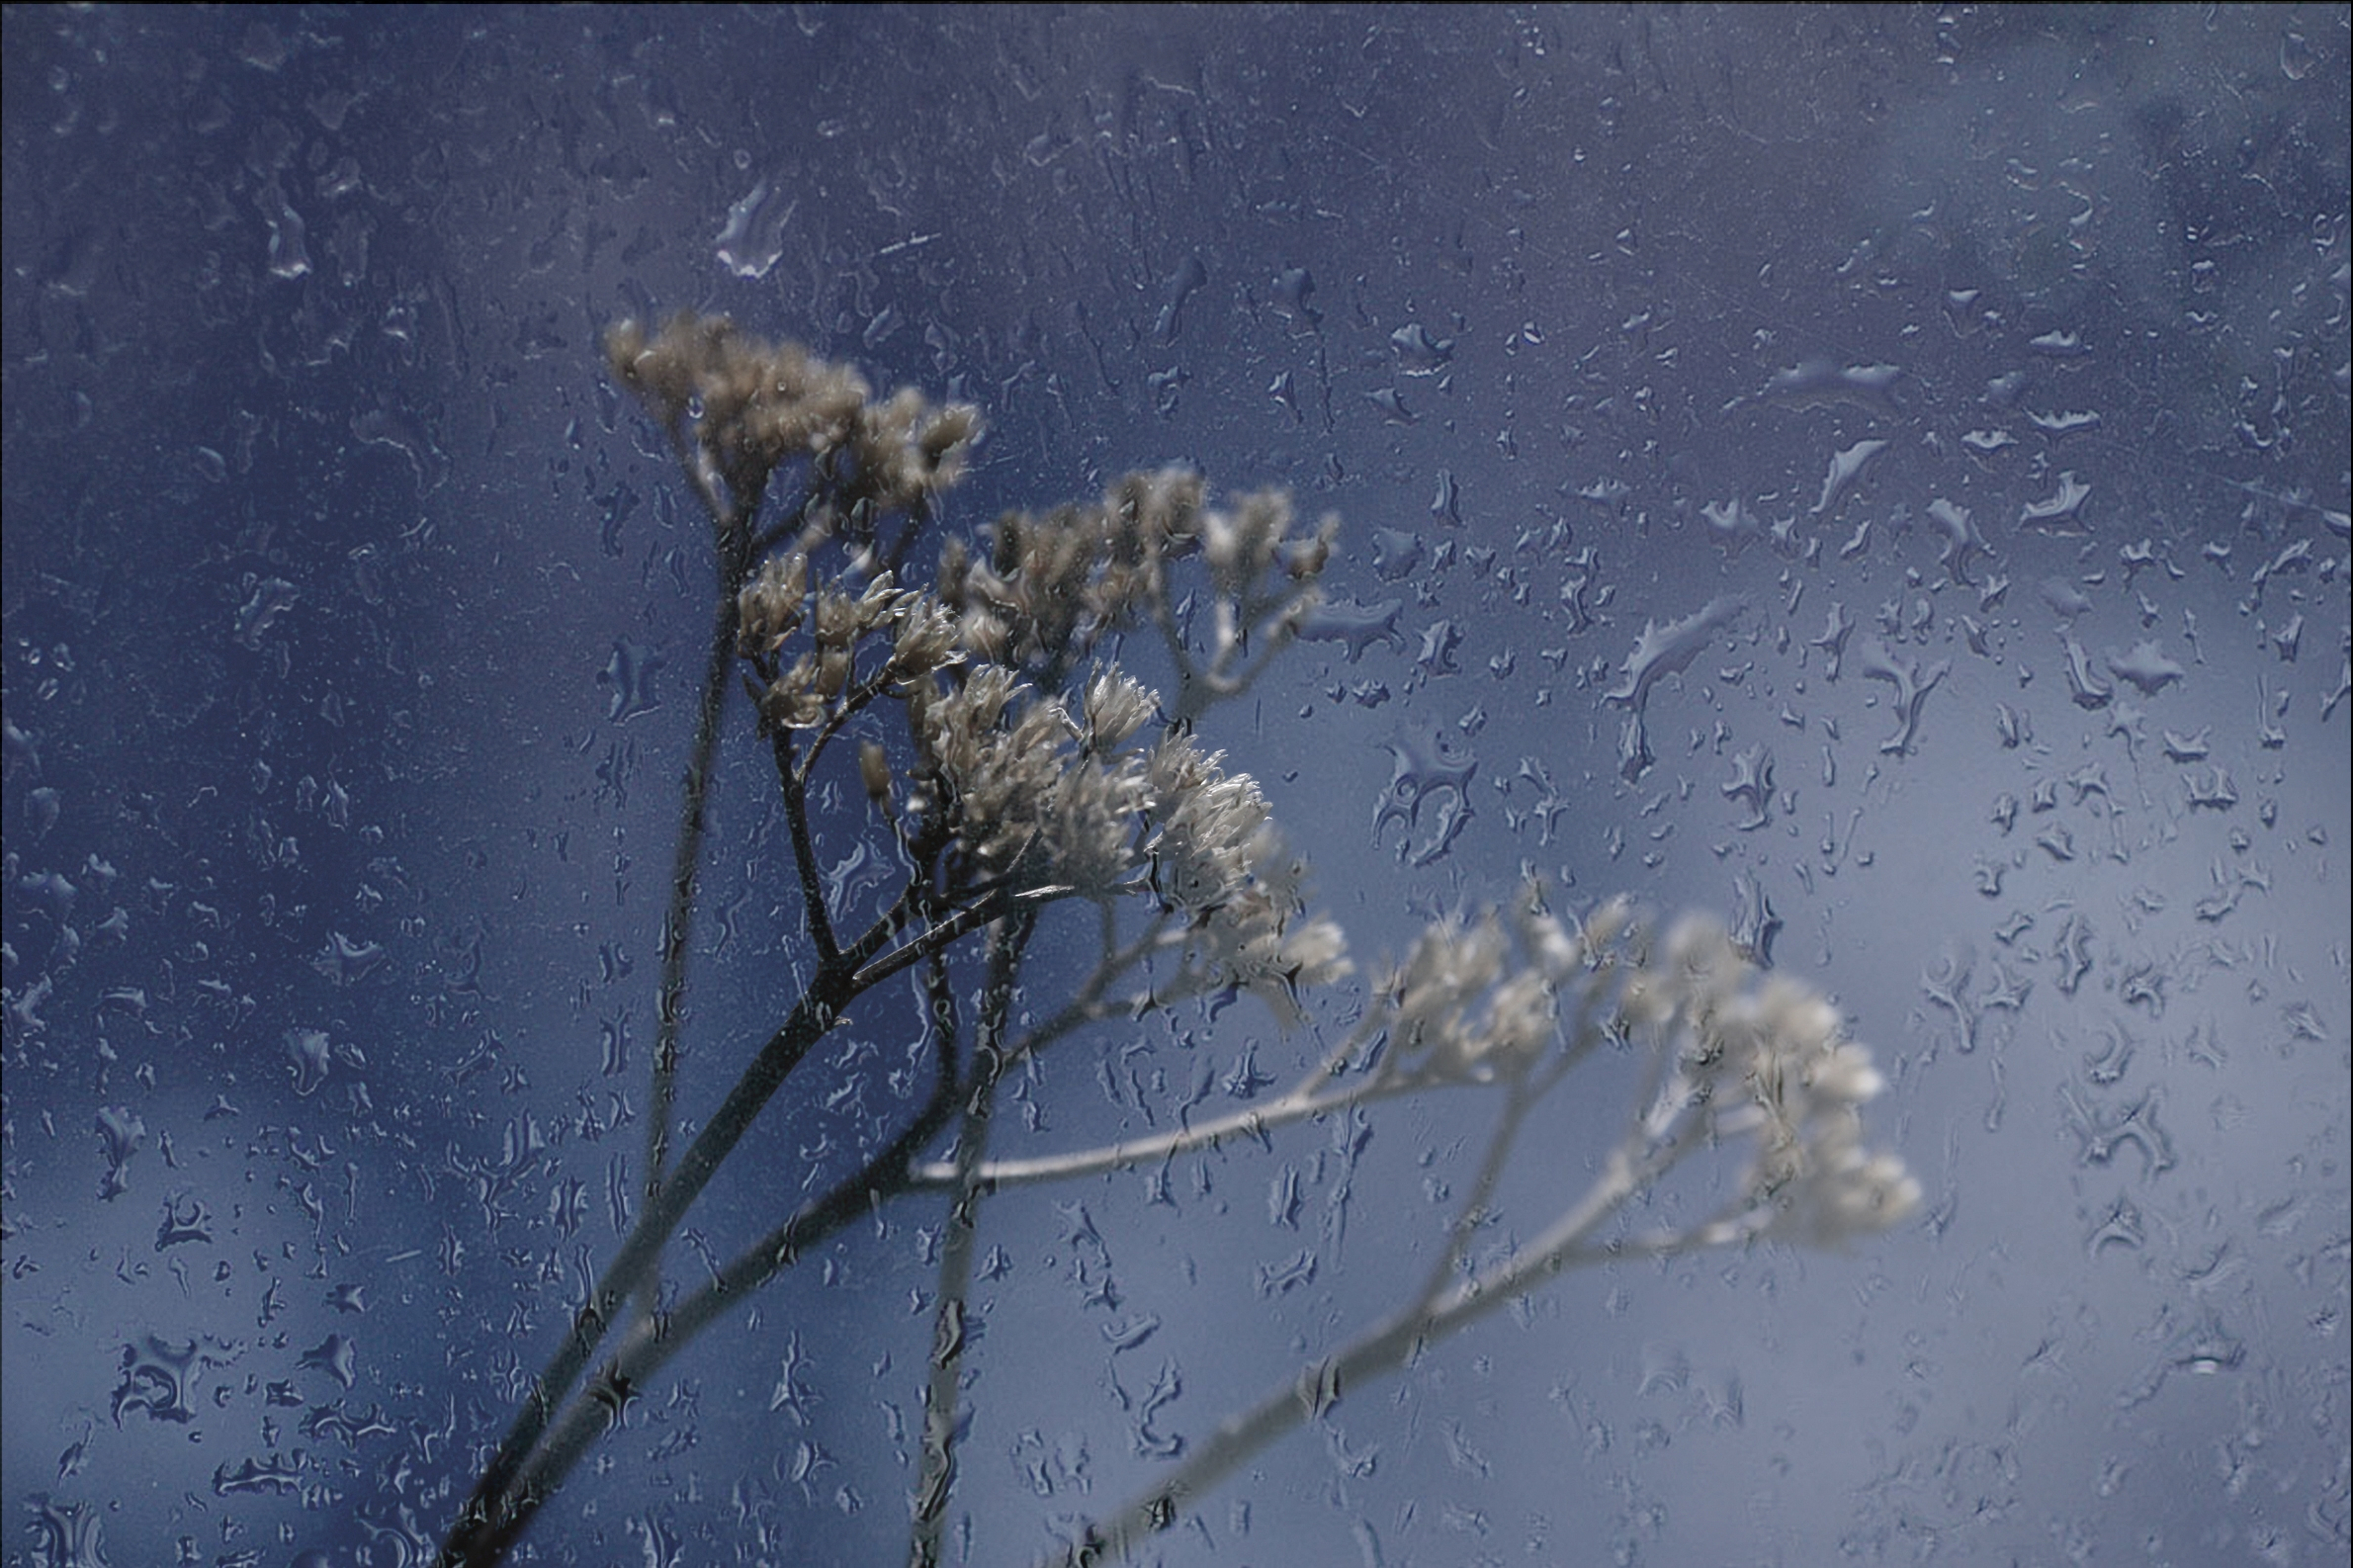 обои мокрое стекло, капли на стекле, растение за стеклом, макро картинки фото